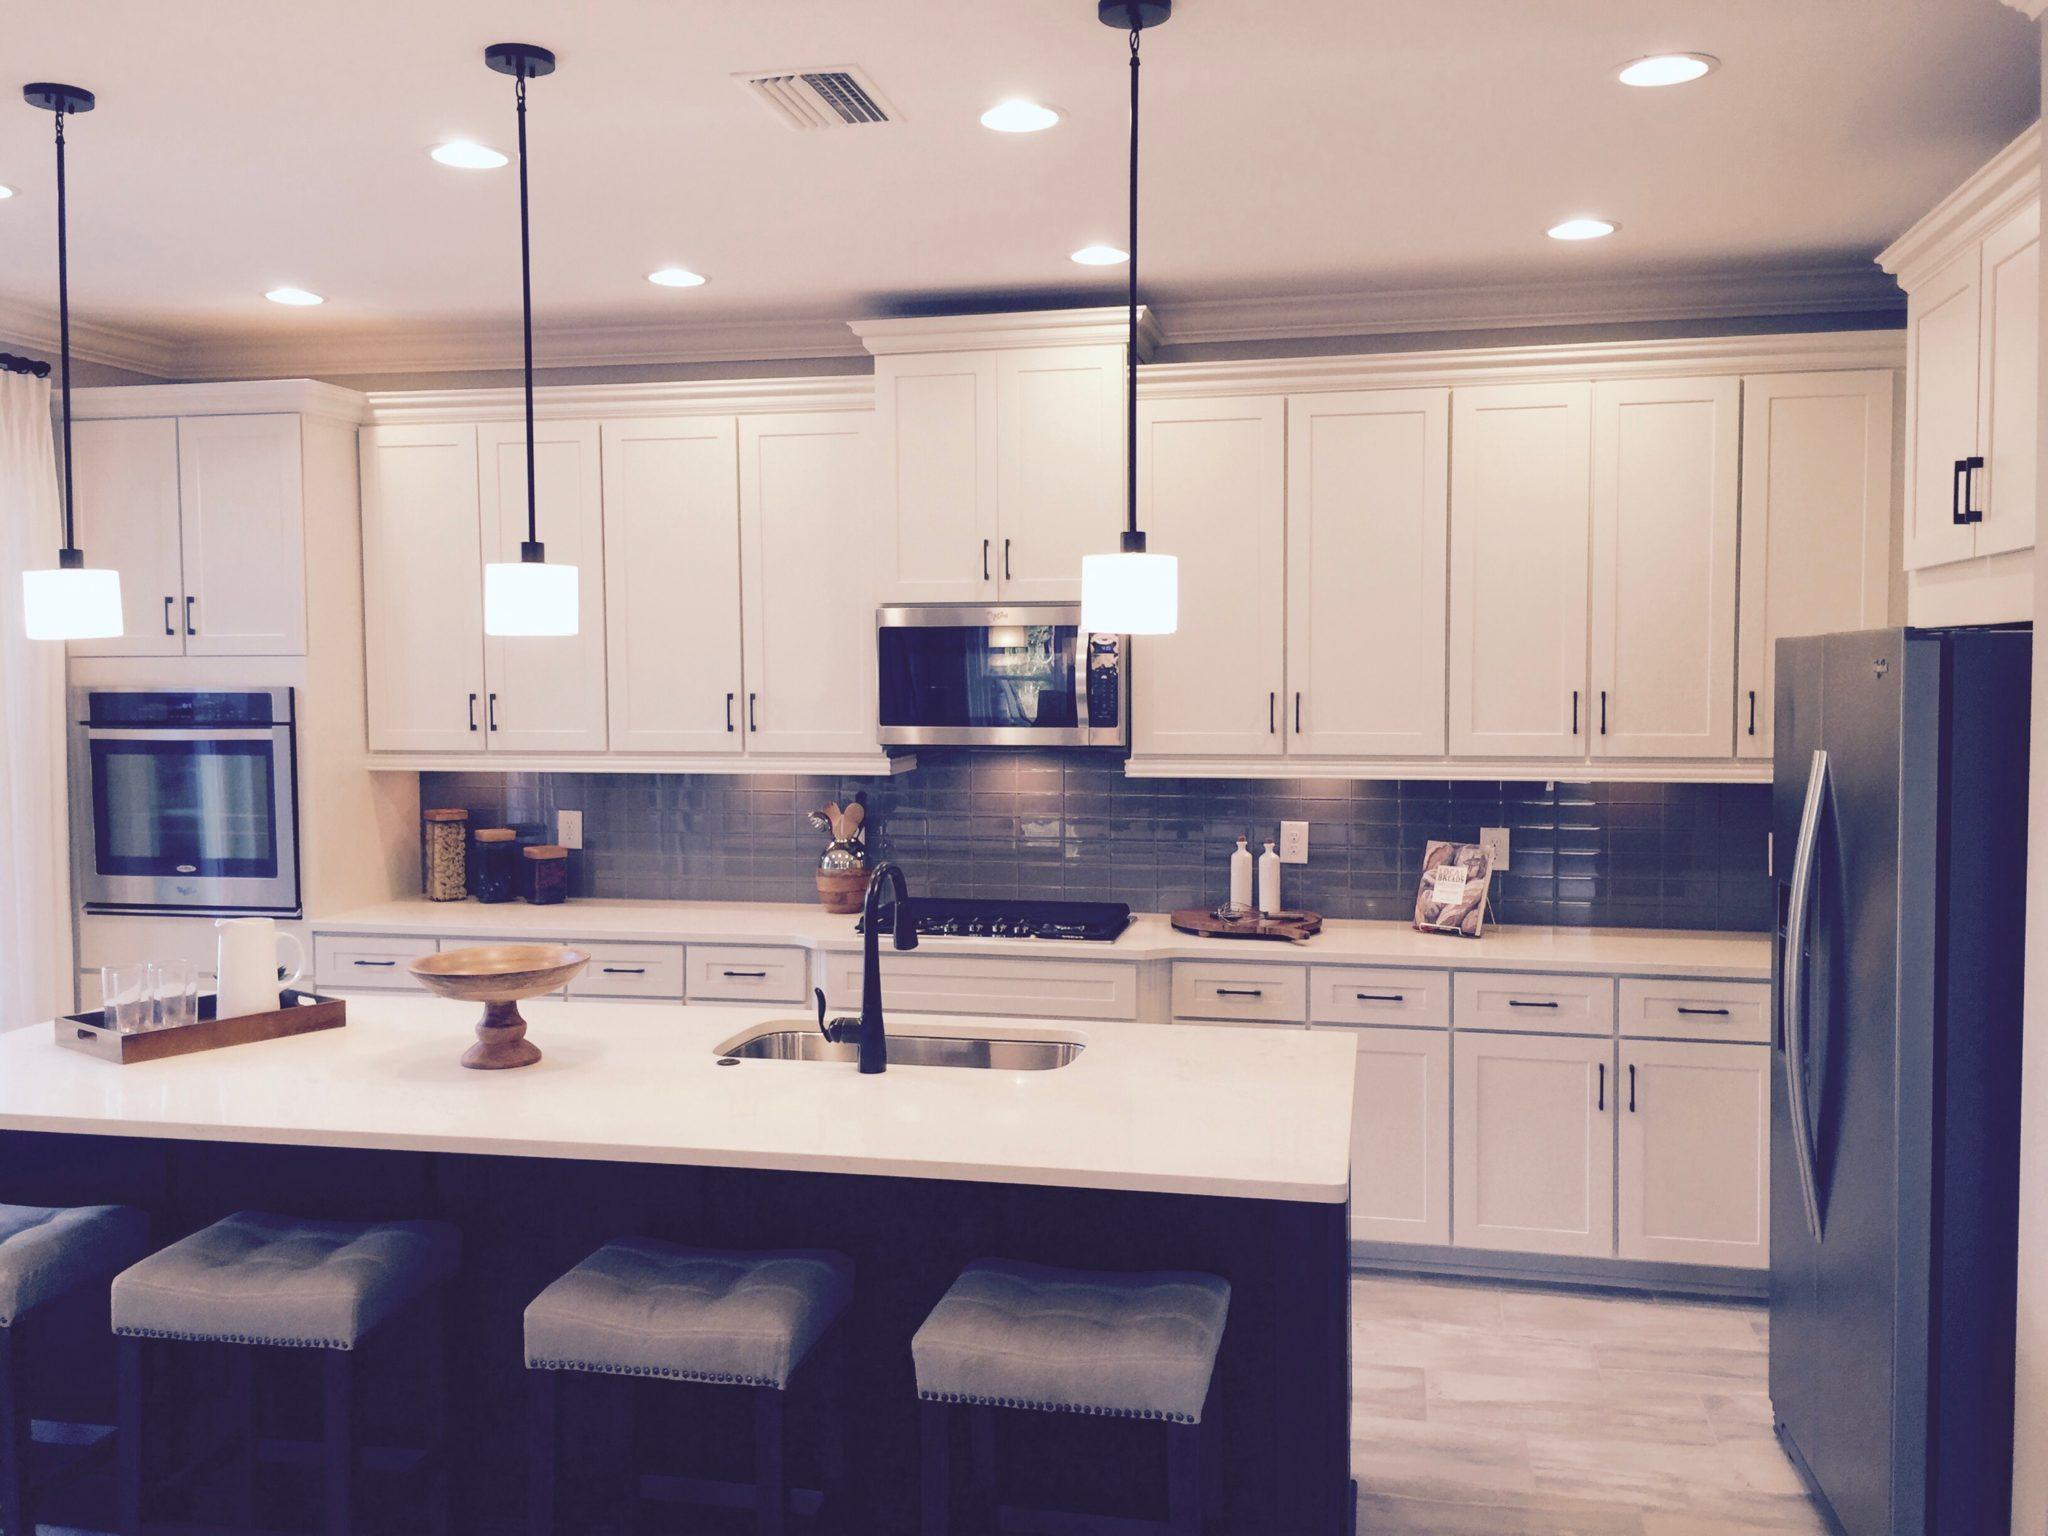 Edrina Hammond - 5 Signs Your Kitchen Needs an Update